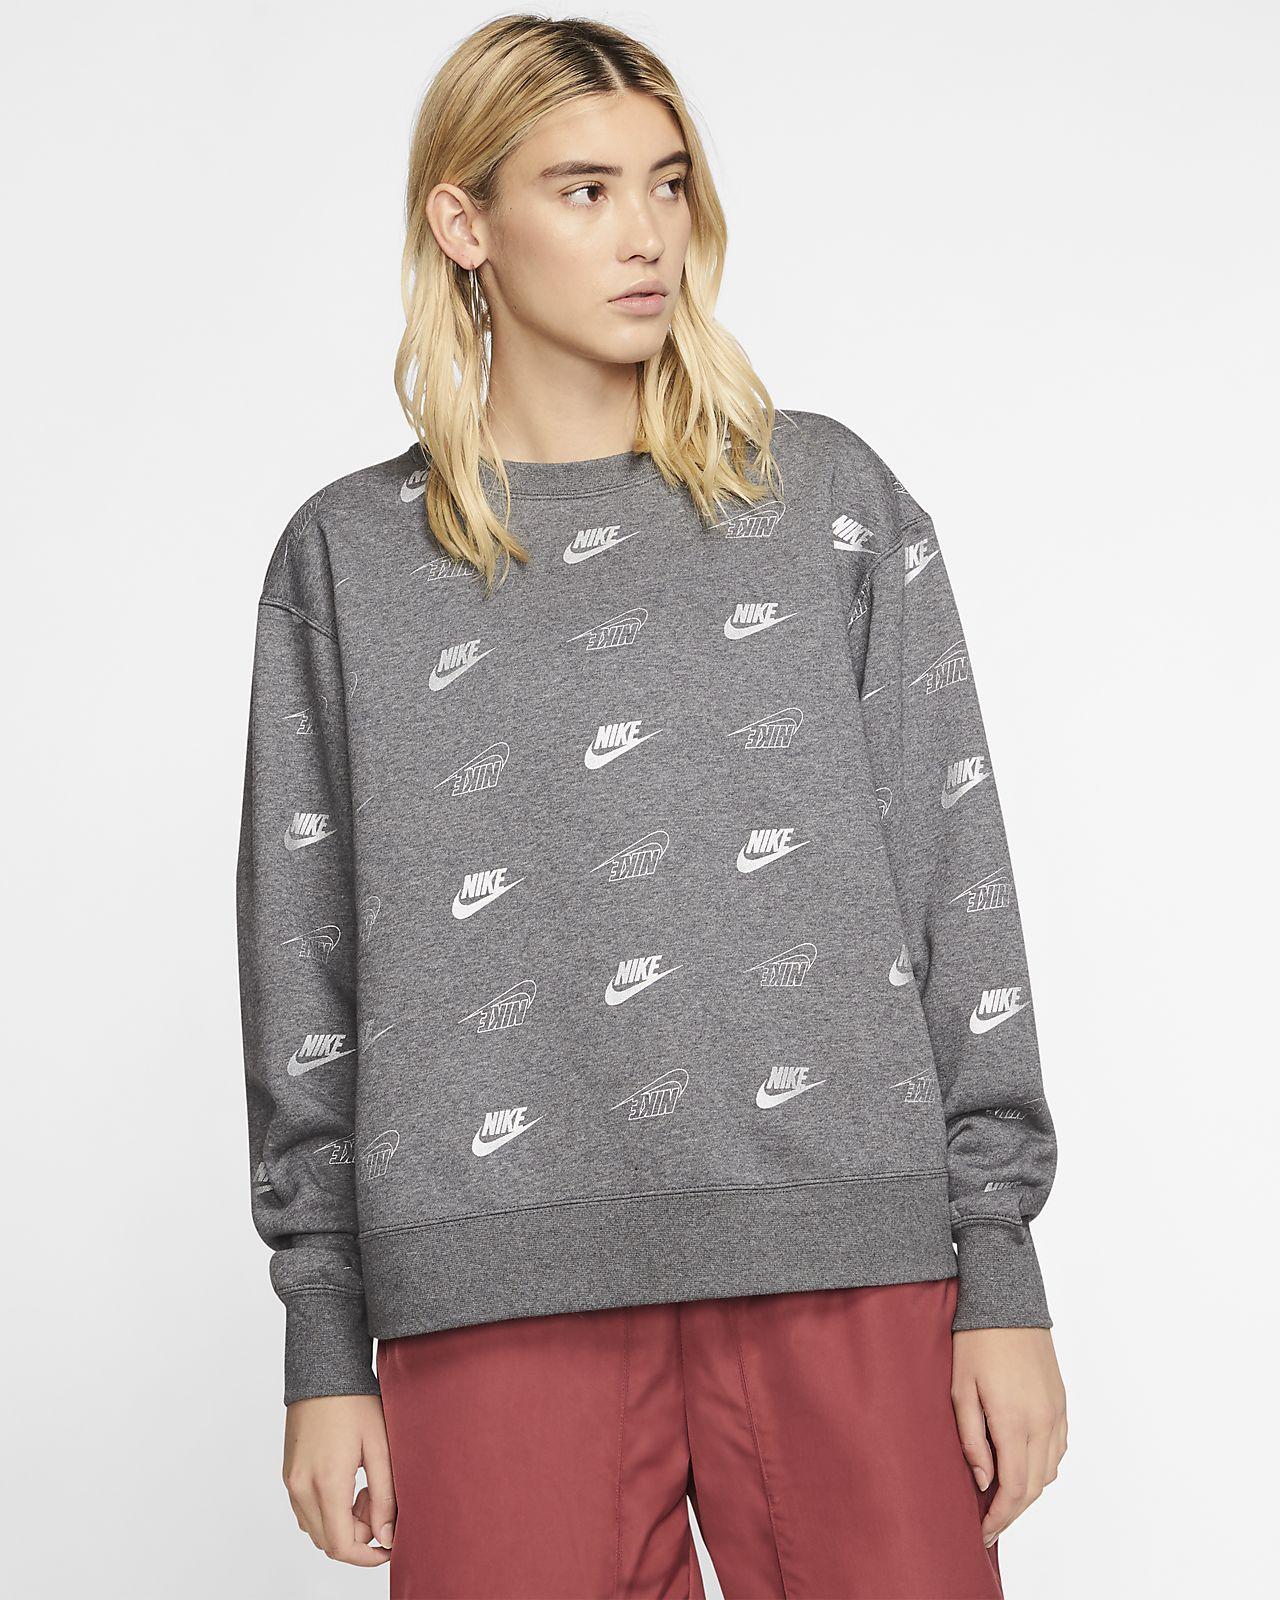 Женский свитшот Nike Sportswear